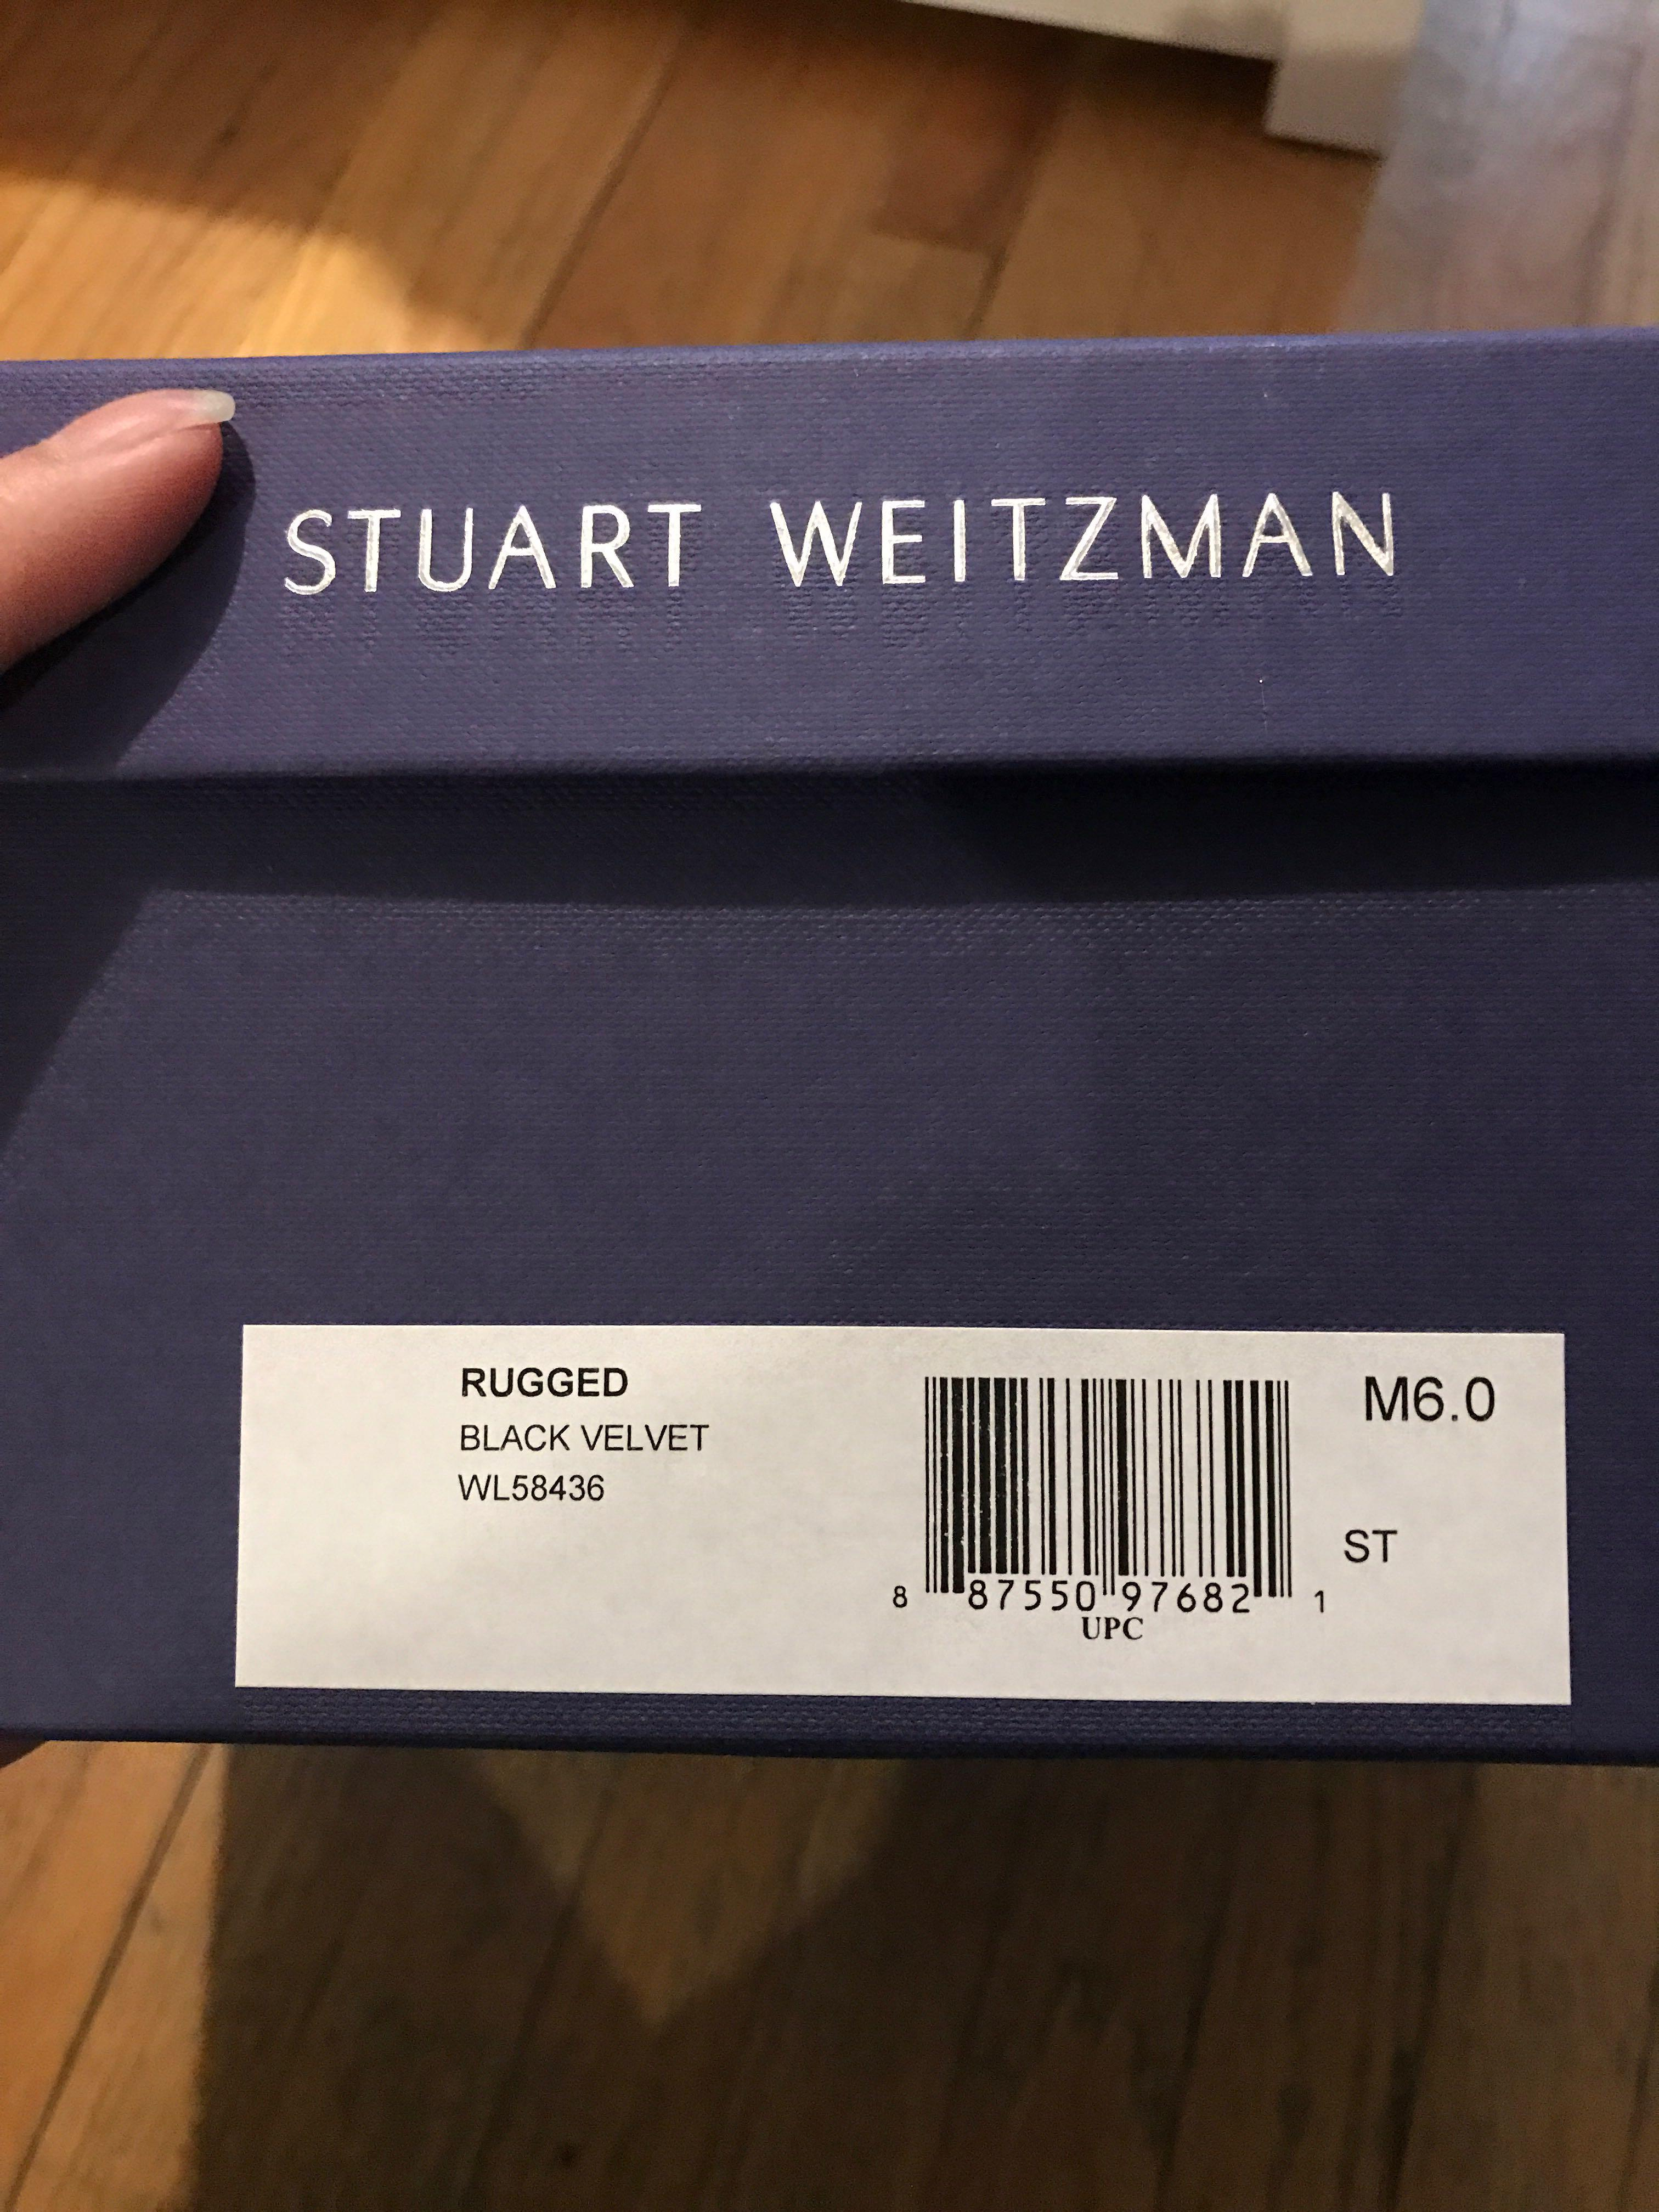 Stuart Weitzman Rugged boots size 6